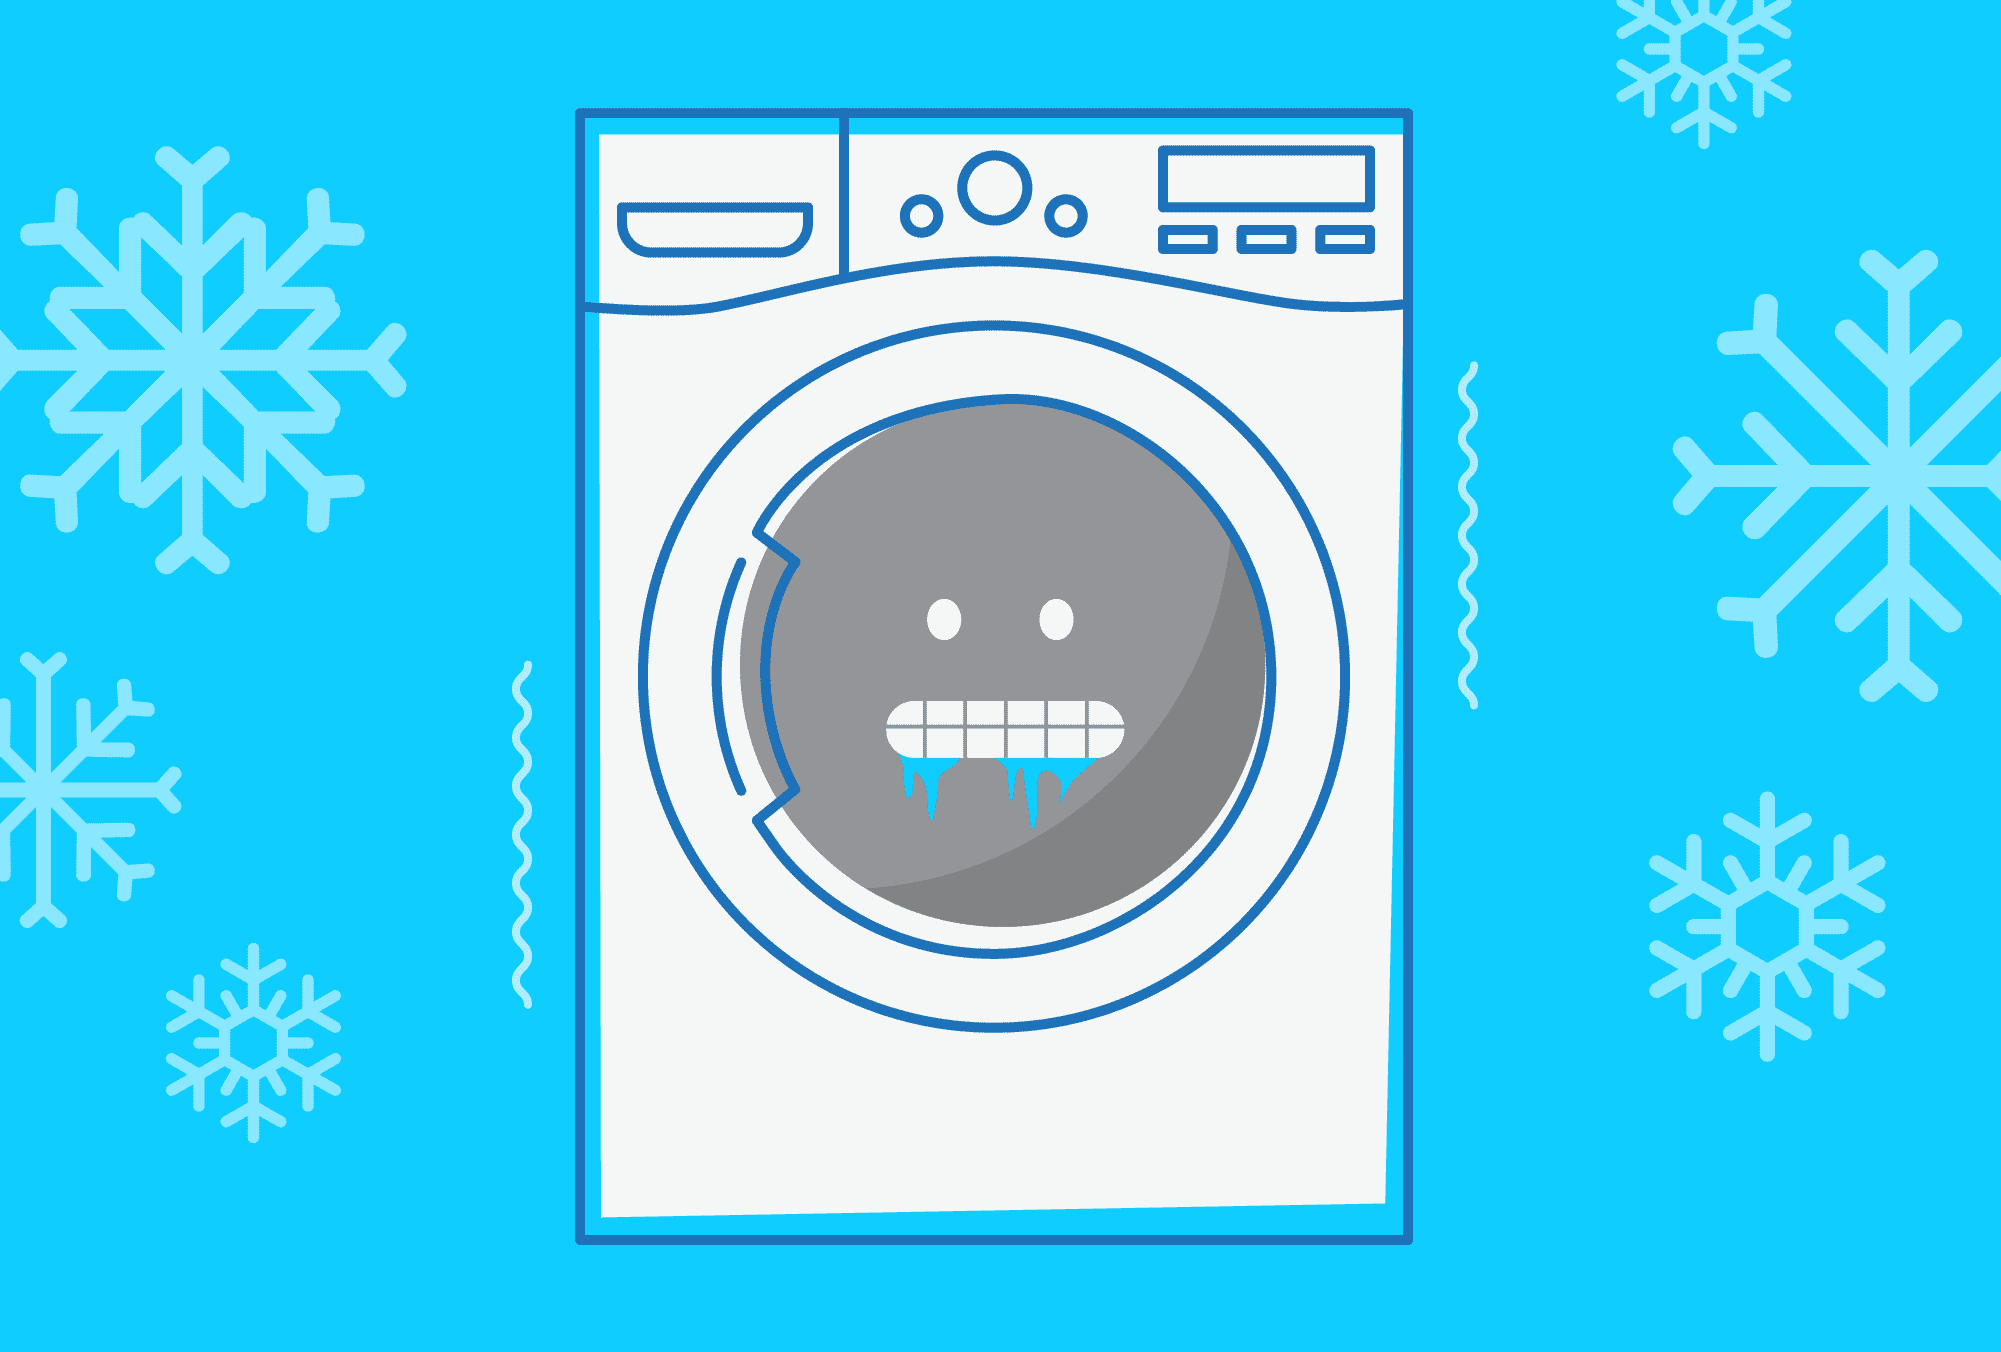 Pourquoi mon sèche-linge ne chauffe plus ?